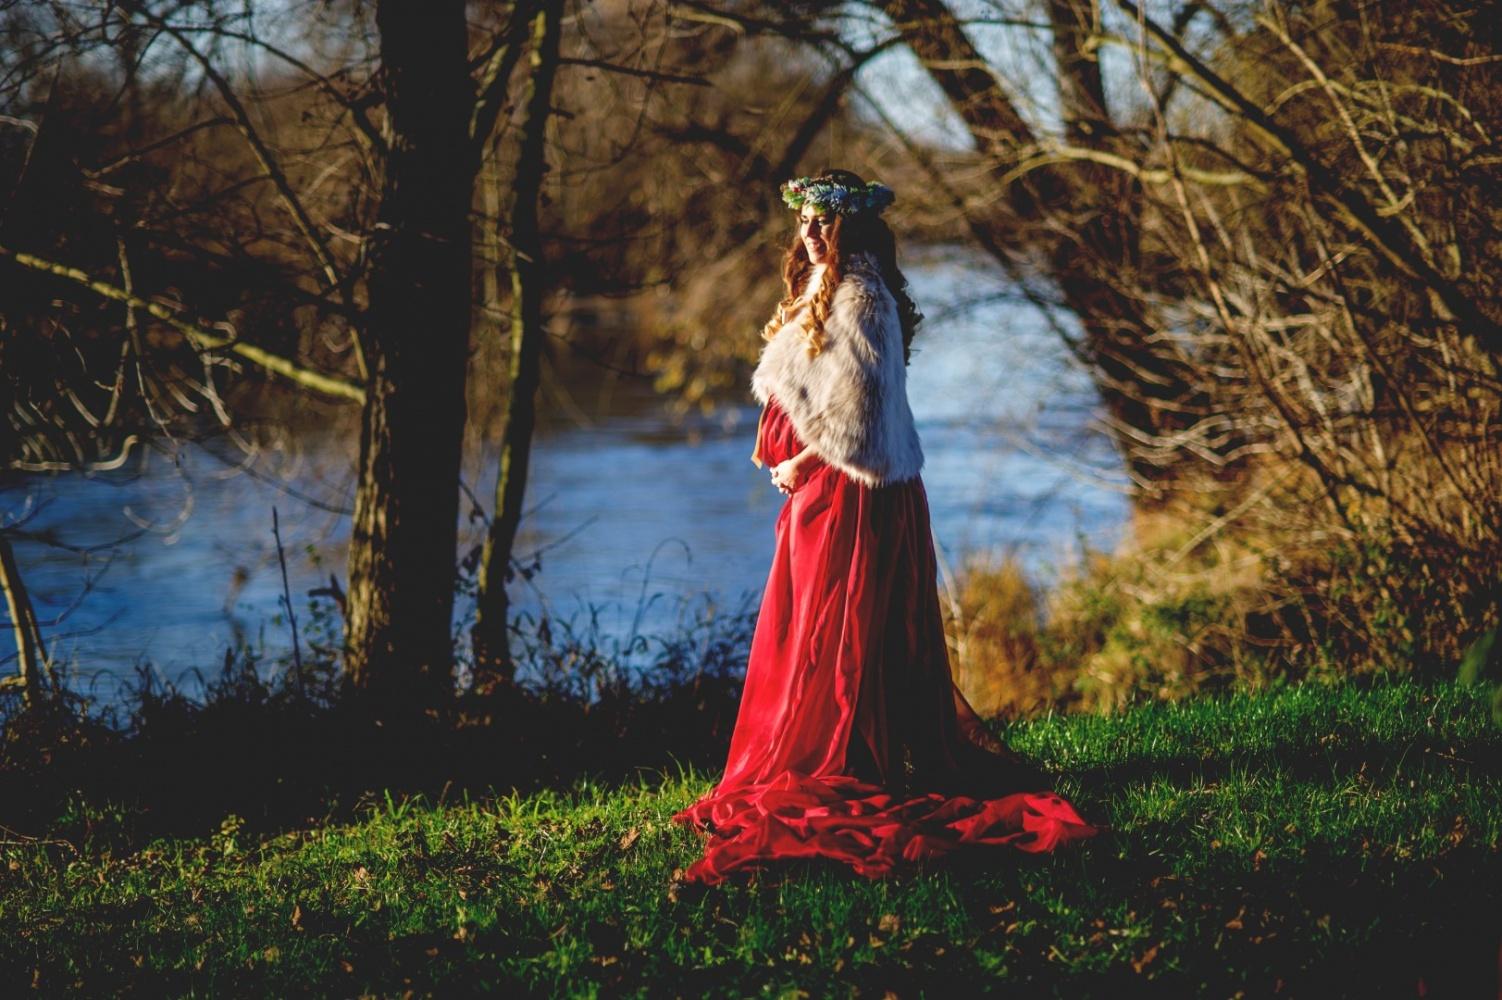 http://www.fotoz.sk/images/gallery-46/normal/szi-kismama-fotozas_kismama-fotok_autumn-pregnacy-photo_fotenie-tehuliek_autumn-maternity-foto_oszi-kismama_tehulka_tehulka-foto_jesenne-fotenie_kreativ-kismama-fotozas016.jpg